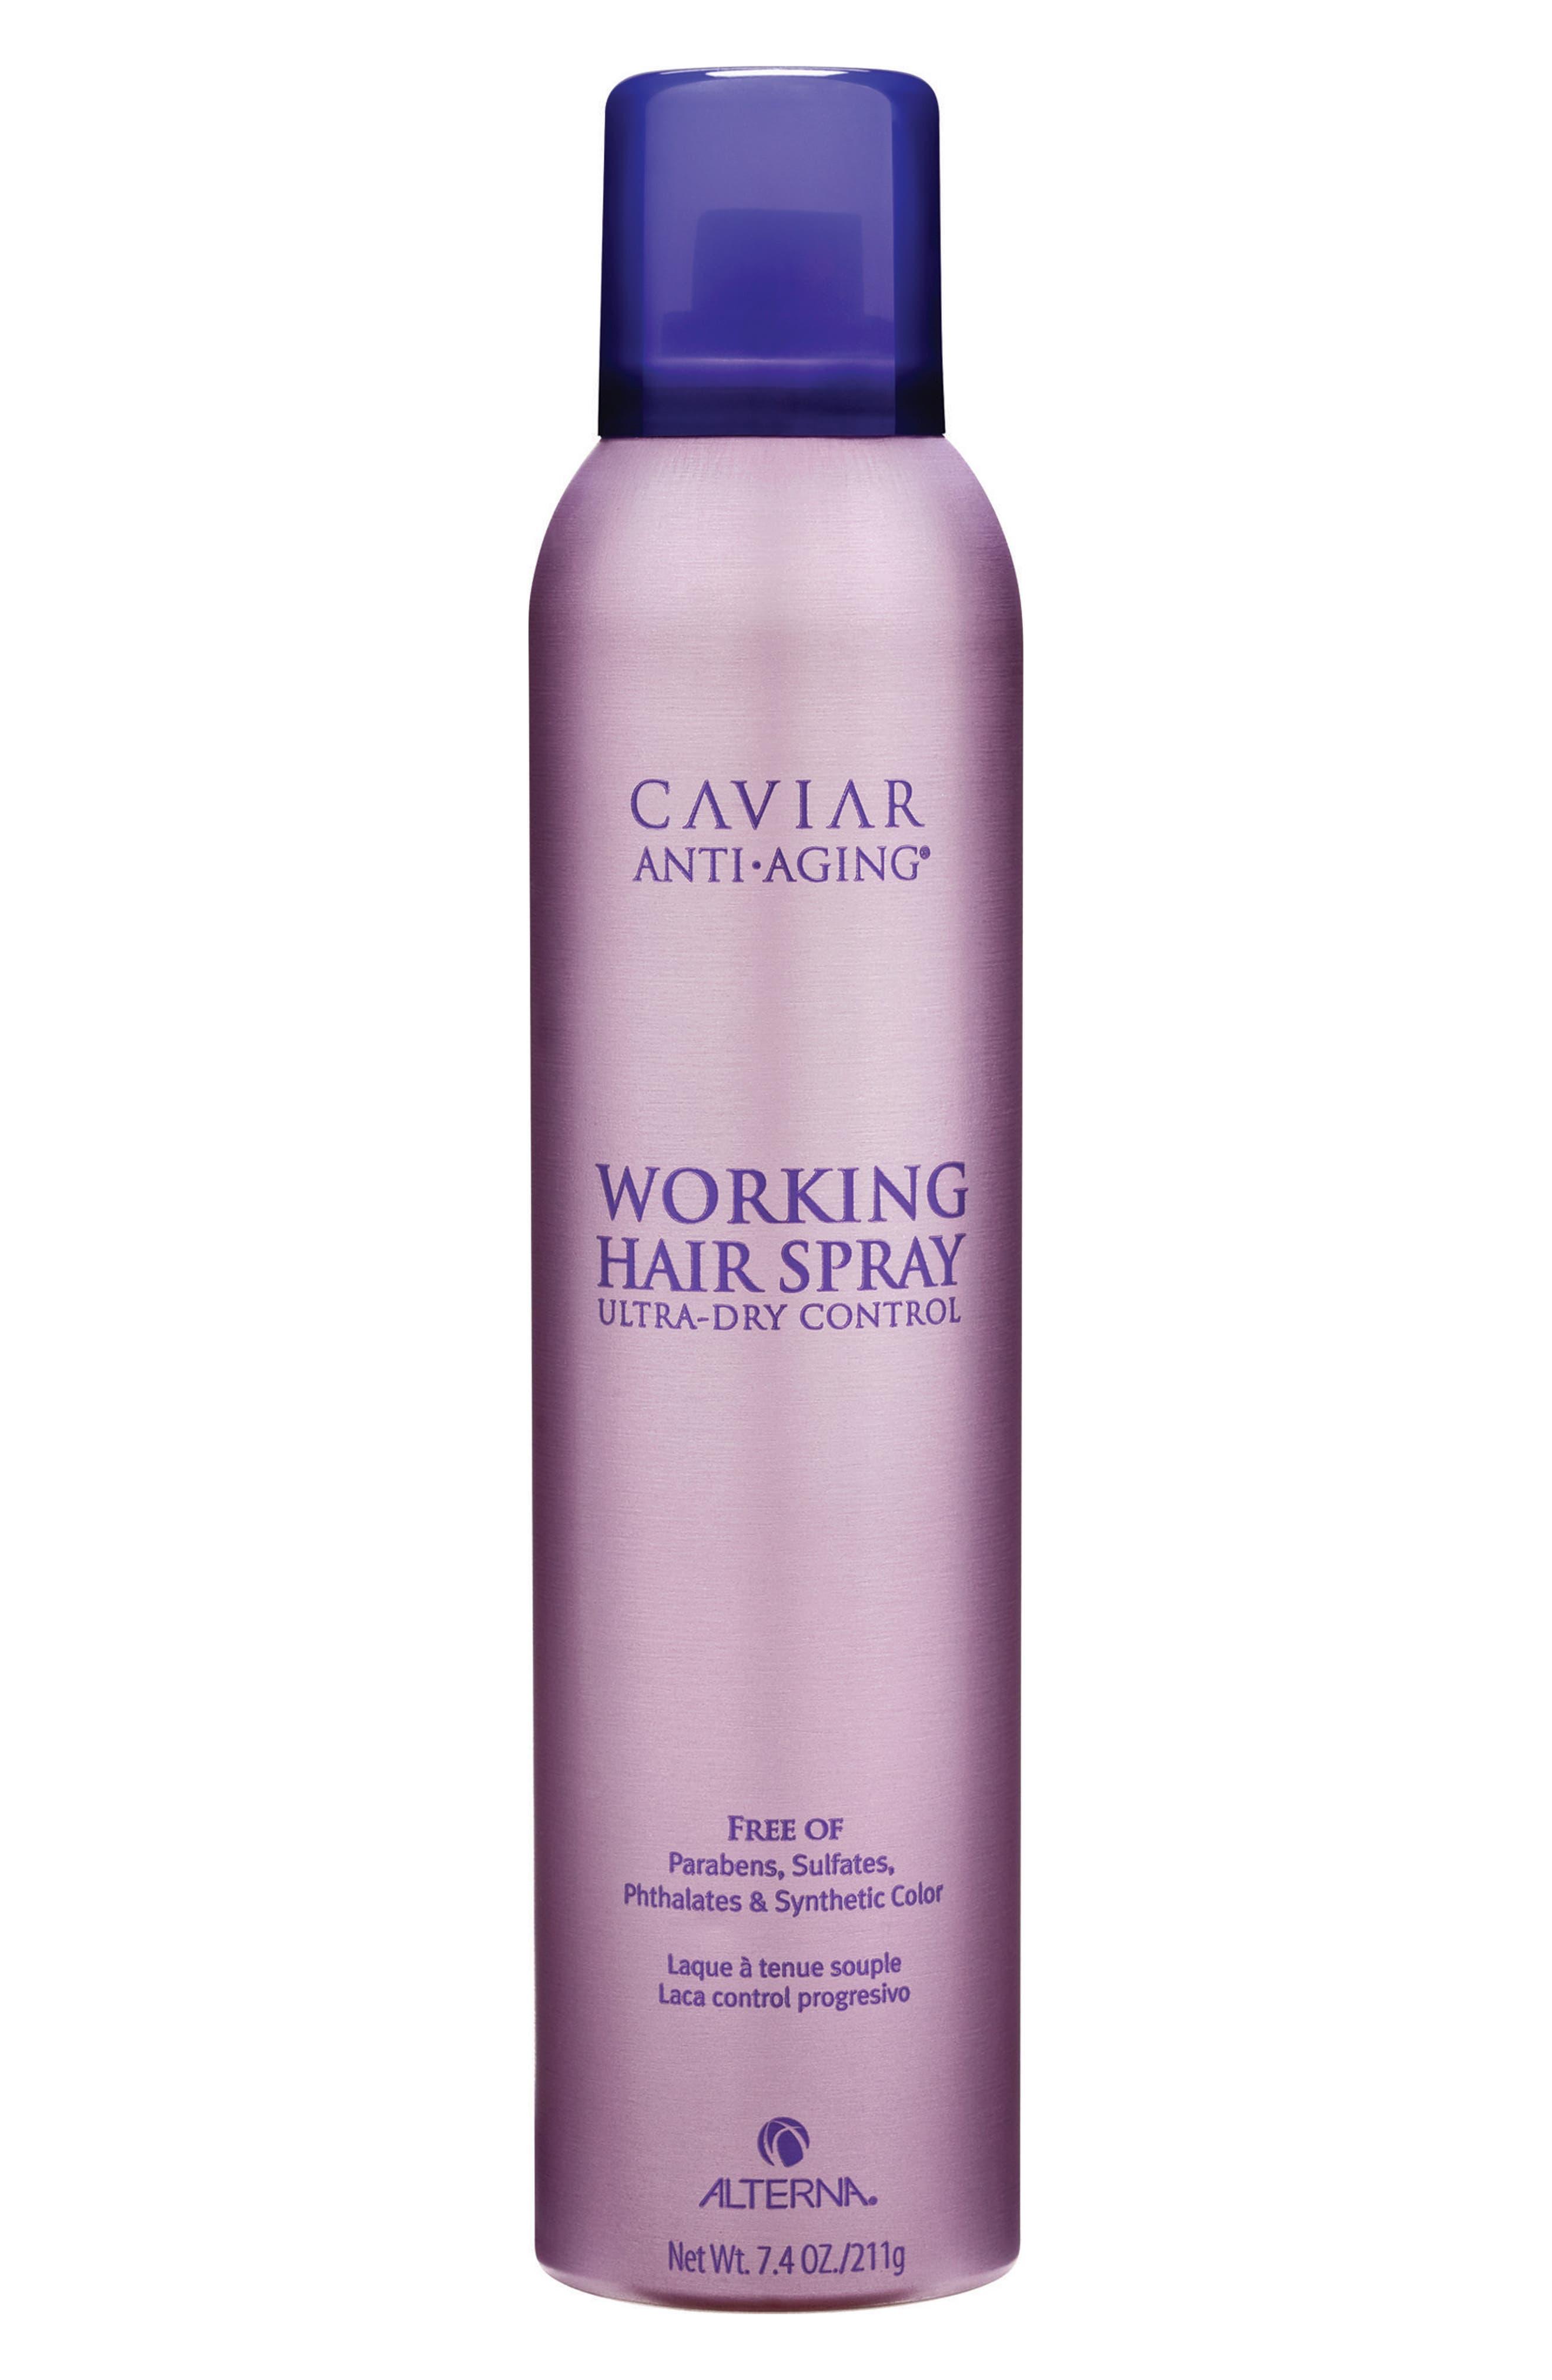 Alternate Image 1 Selected - ALTERNA® Caviar Anti-Aging Working Hair Spray